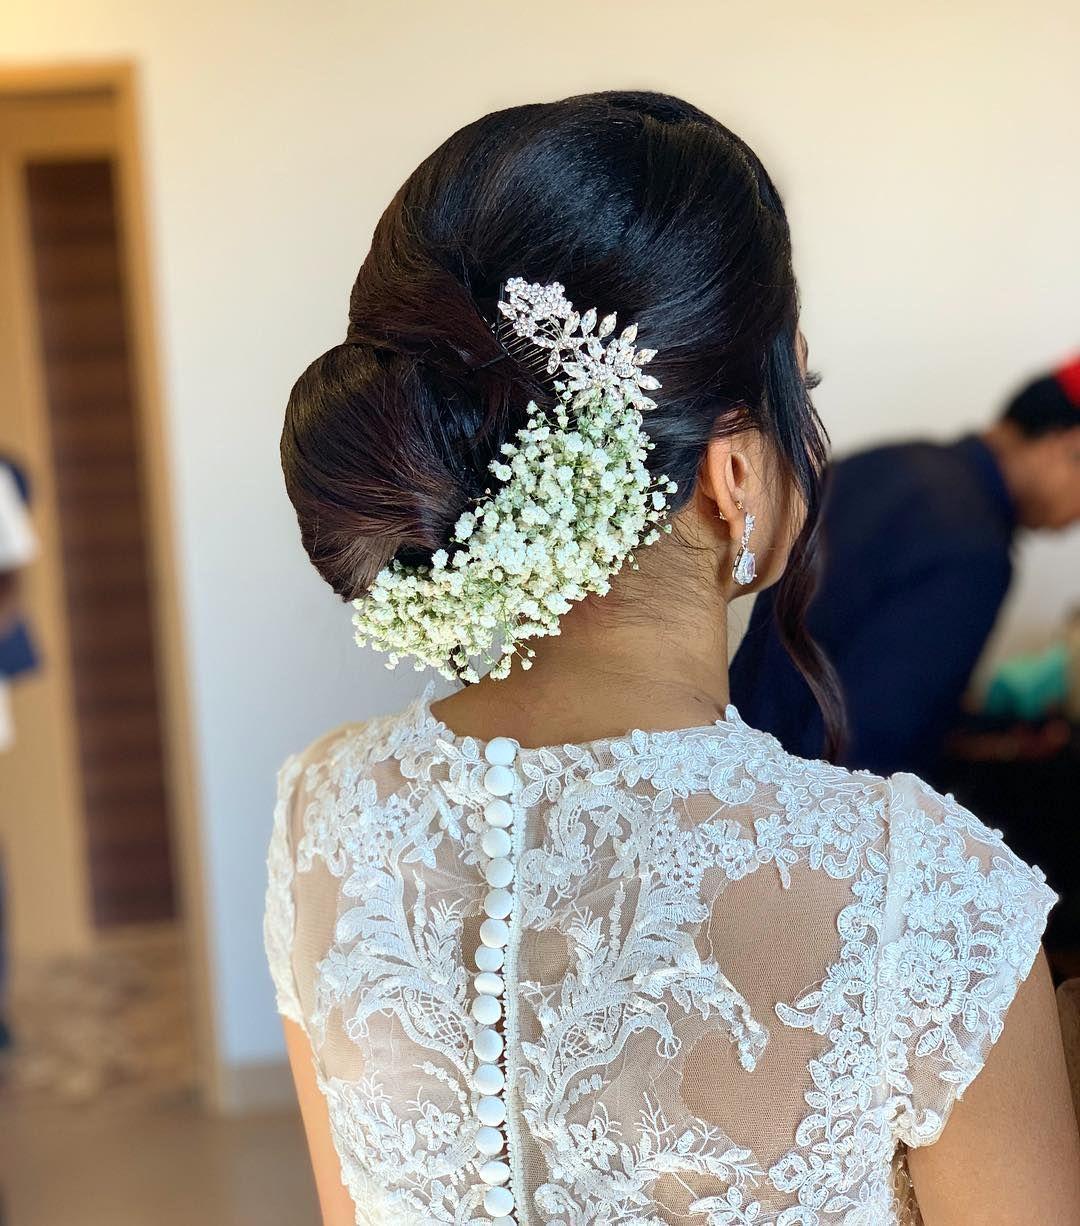 Makeup Arti T On Instagram Christian Bridal Updo Makeup And Hairstyling Vetrihairandmakeup